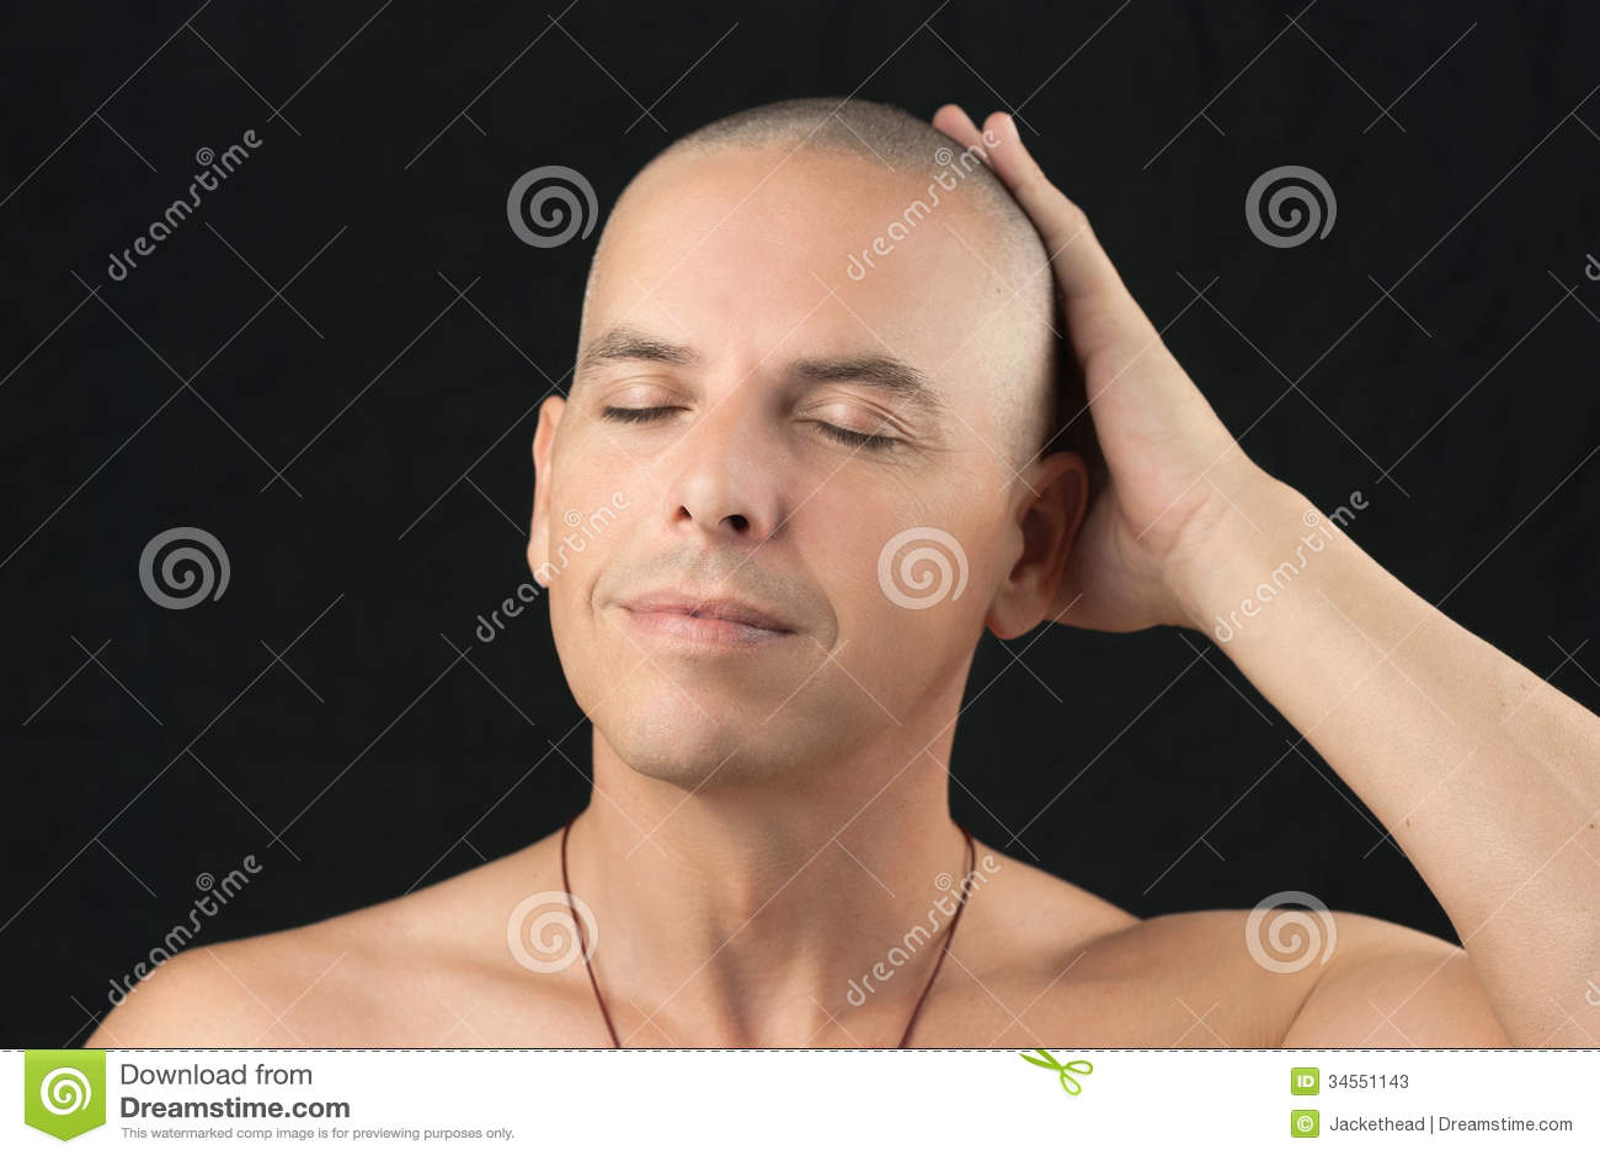 Cabeza de familia su imagen afeitada